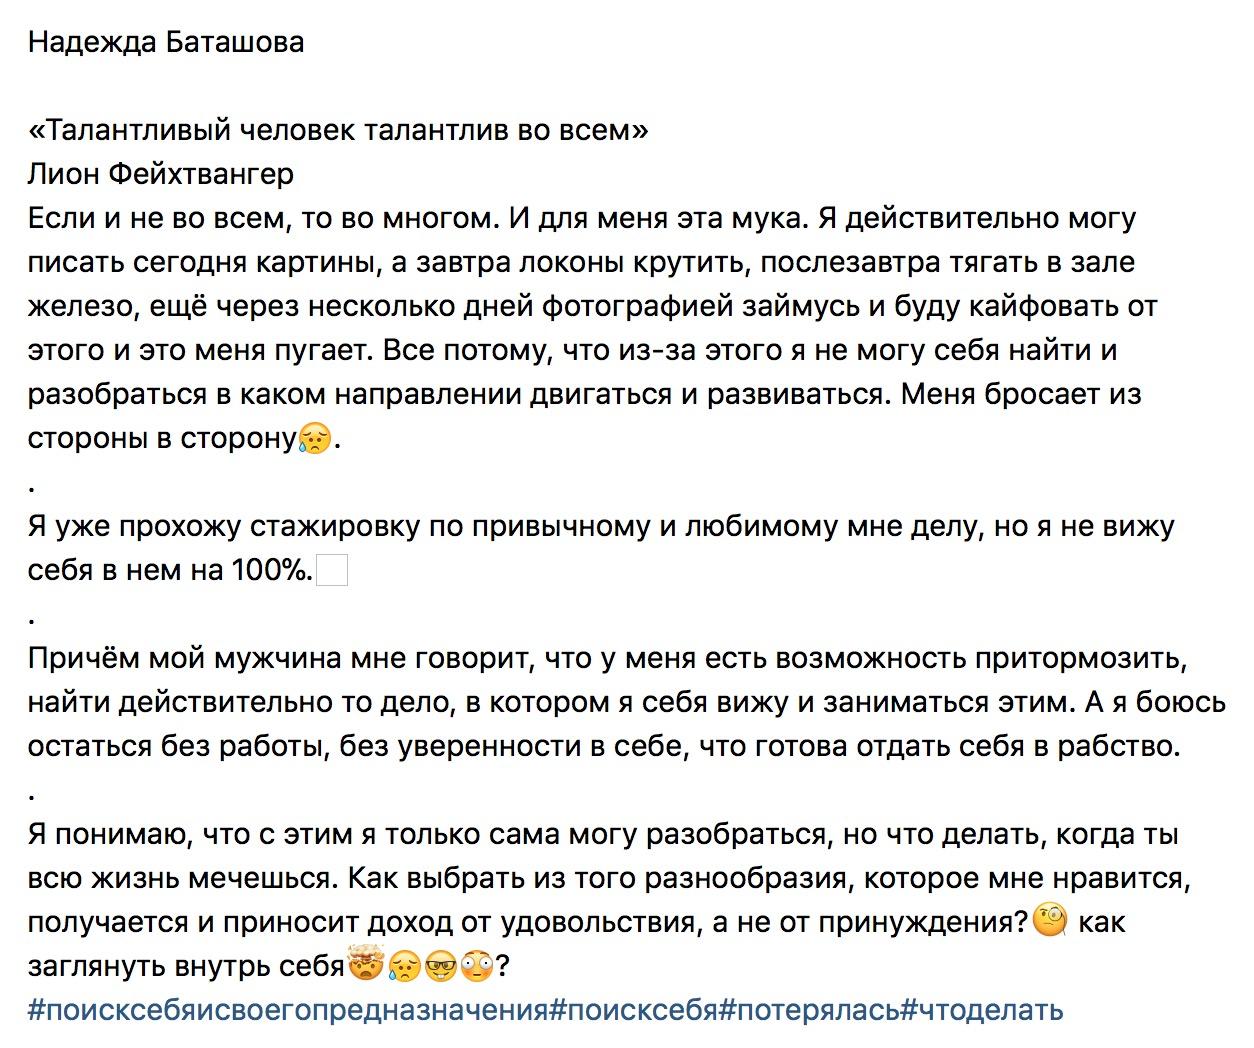 Надежда Баташова о таланте